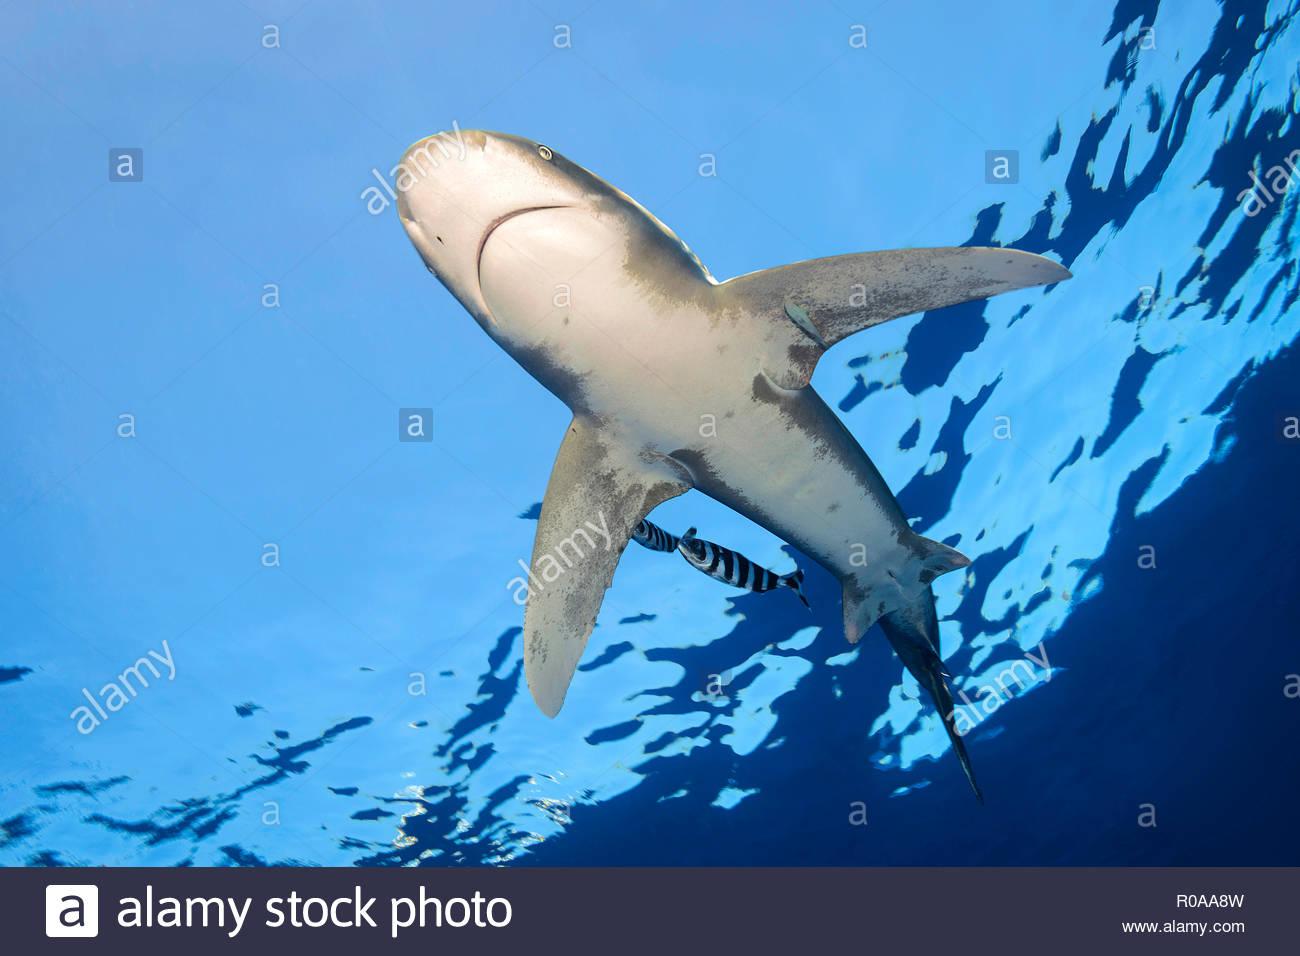 Weißspitzen-Hochseehai (Carcharhinus Longimanus), Elphistone Reef, Ägypten | Oceanic whitetip shark (Carcharhinus longimanus), Elphistone Reef, Egypt - Stock Image